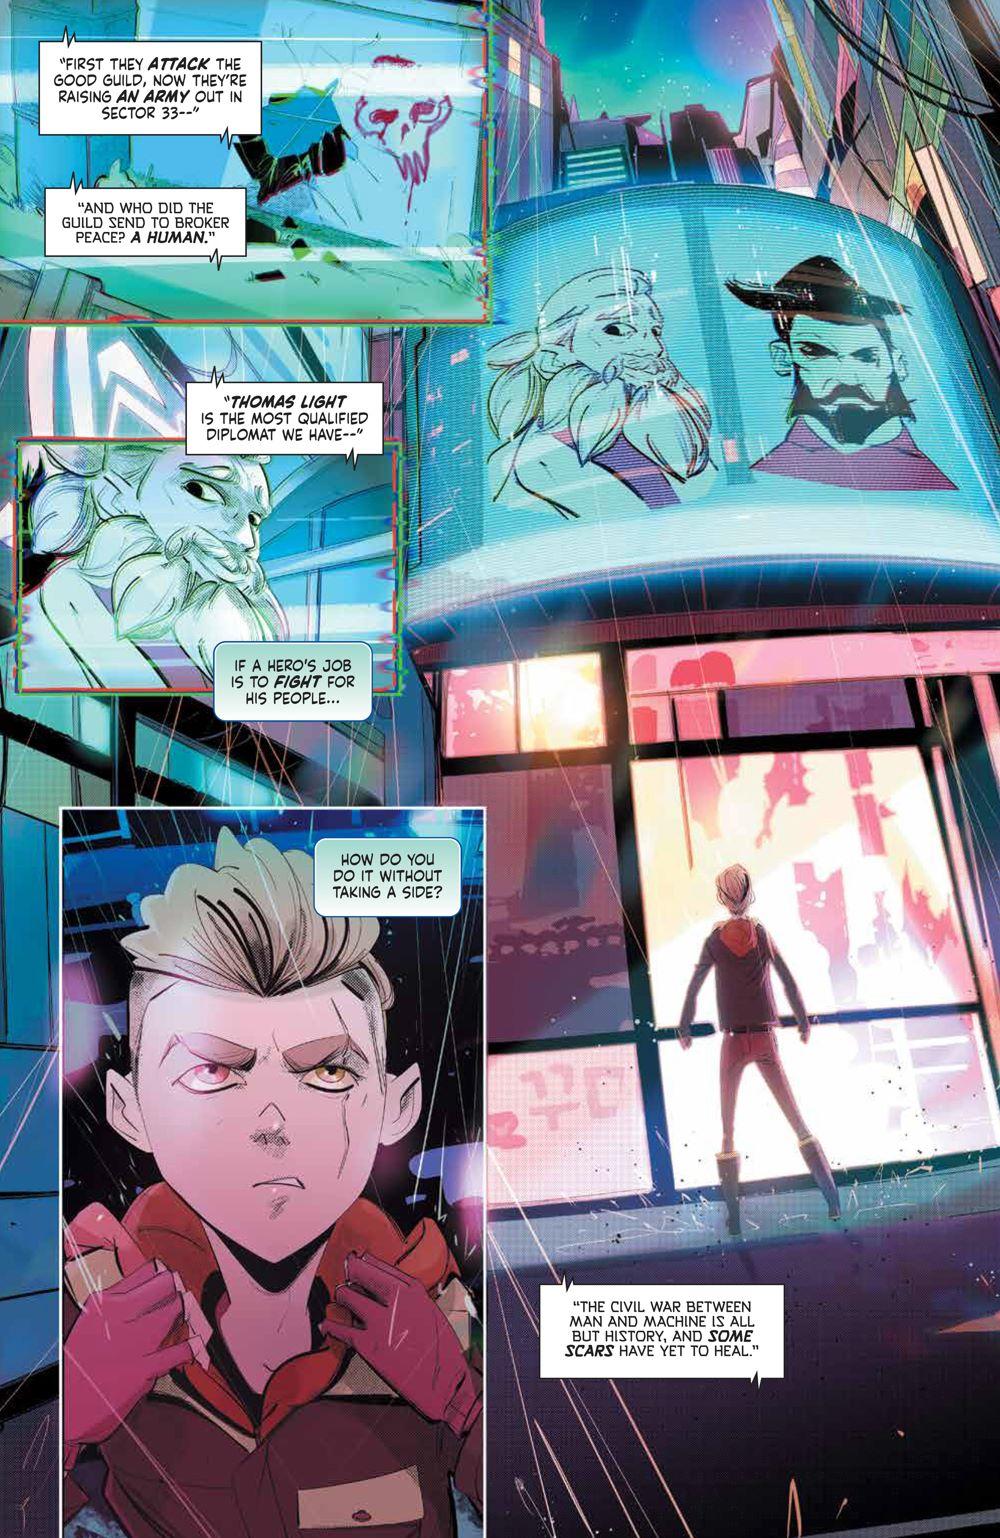 MegaMan_FullyCharged_001_PRESS_4 ComicList Previews: MEGA MAN FULLY CHARGED #1